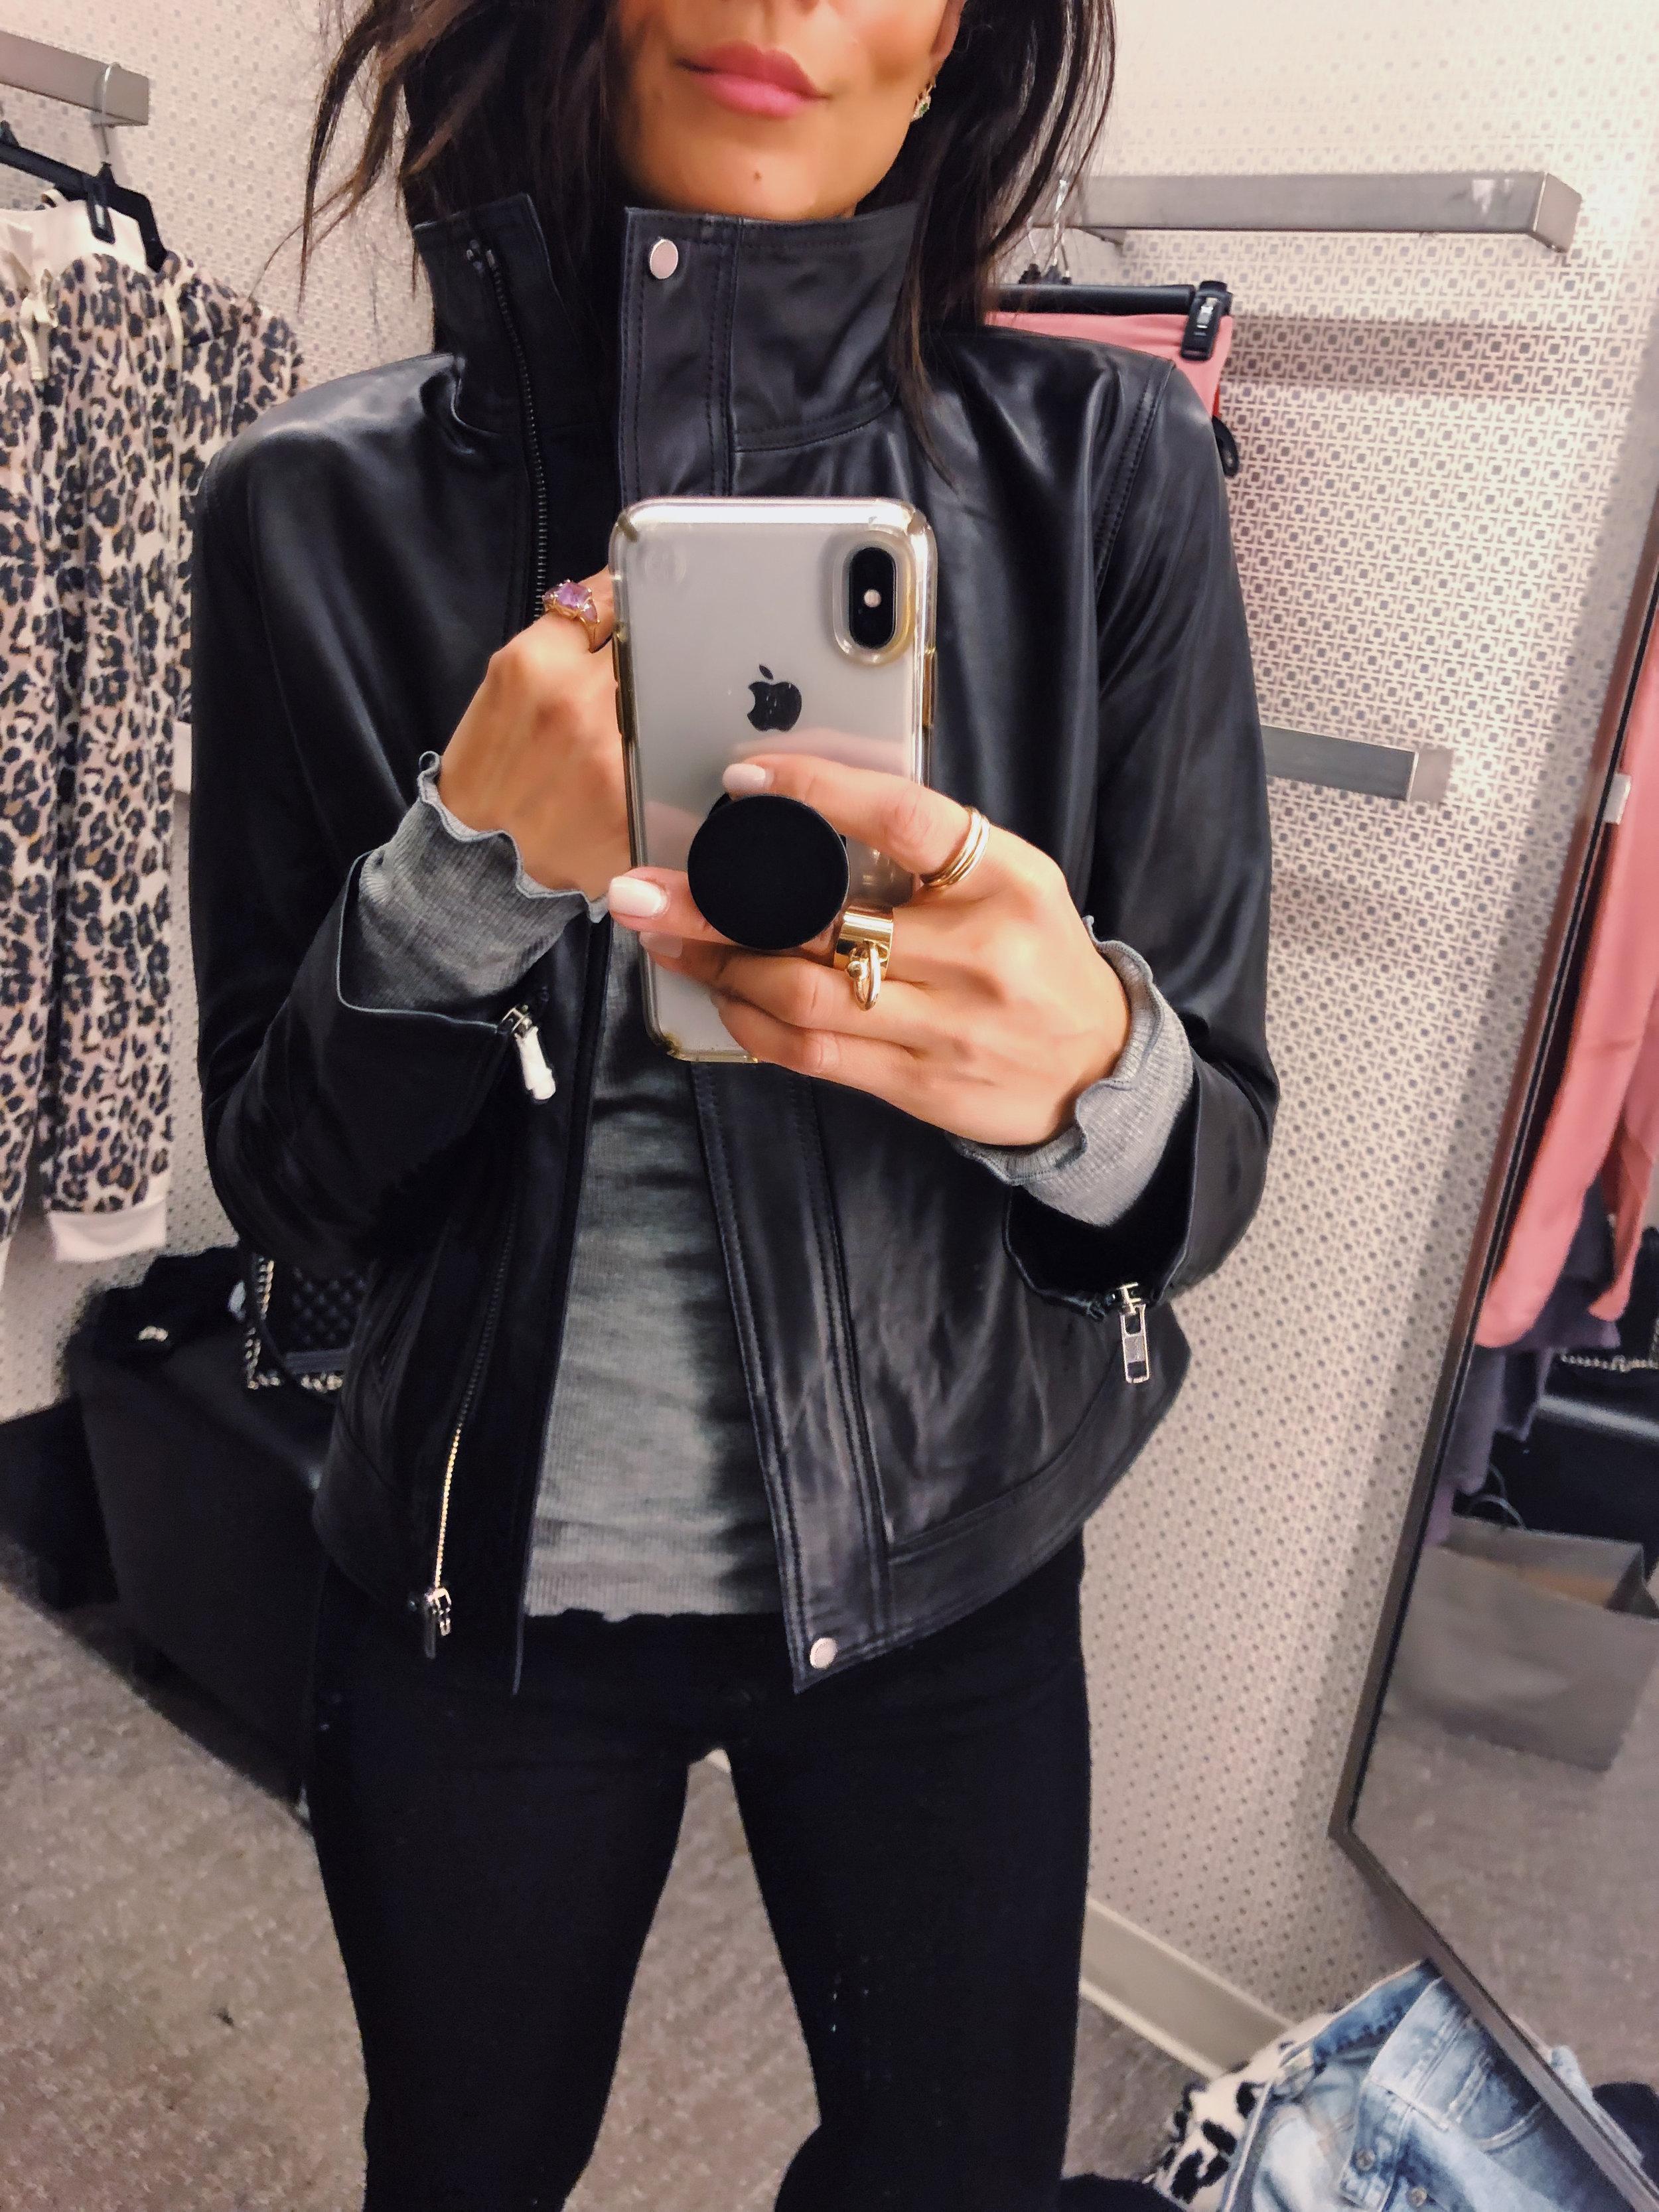 Wearing XS Jacket